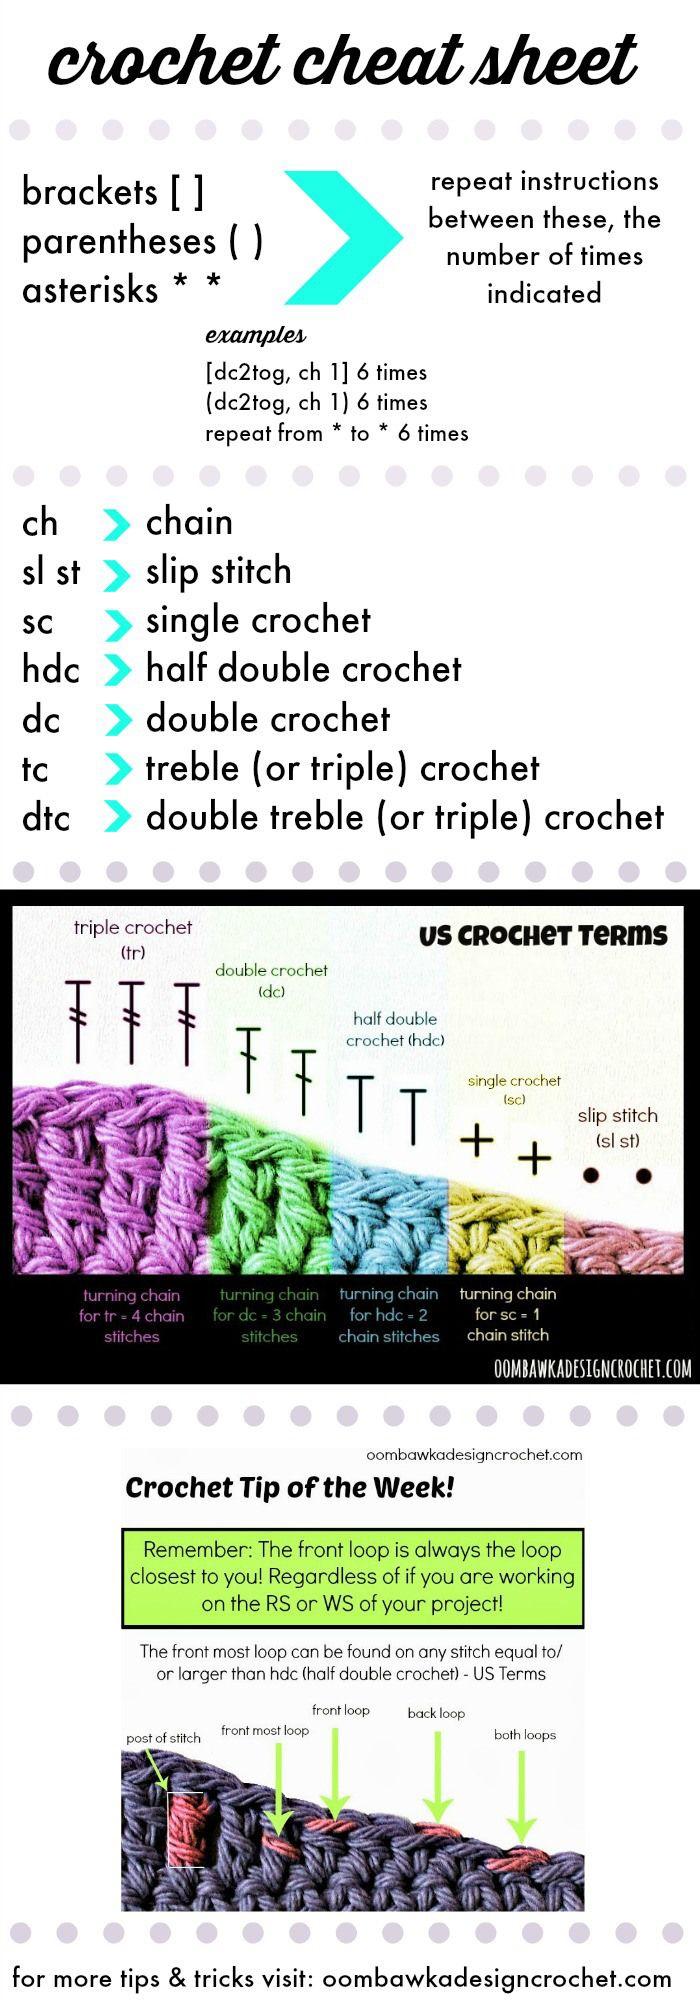 Crochet Cheat Sheet from Oombawka Design